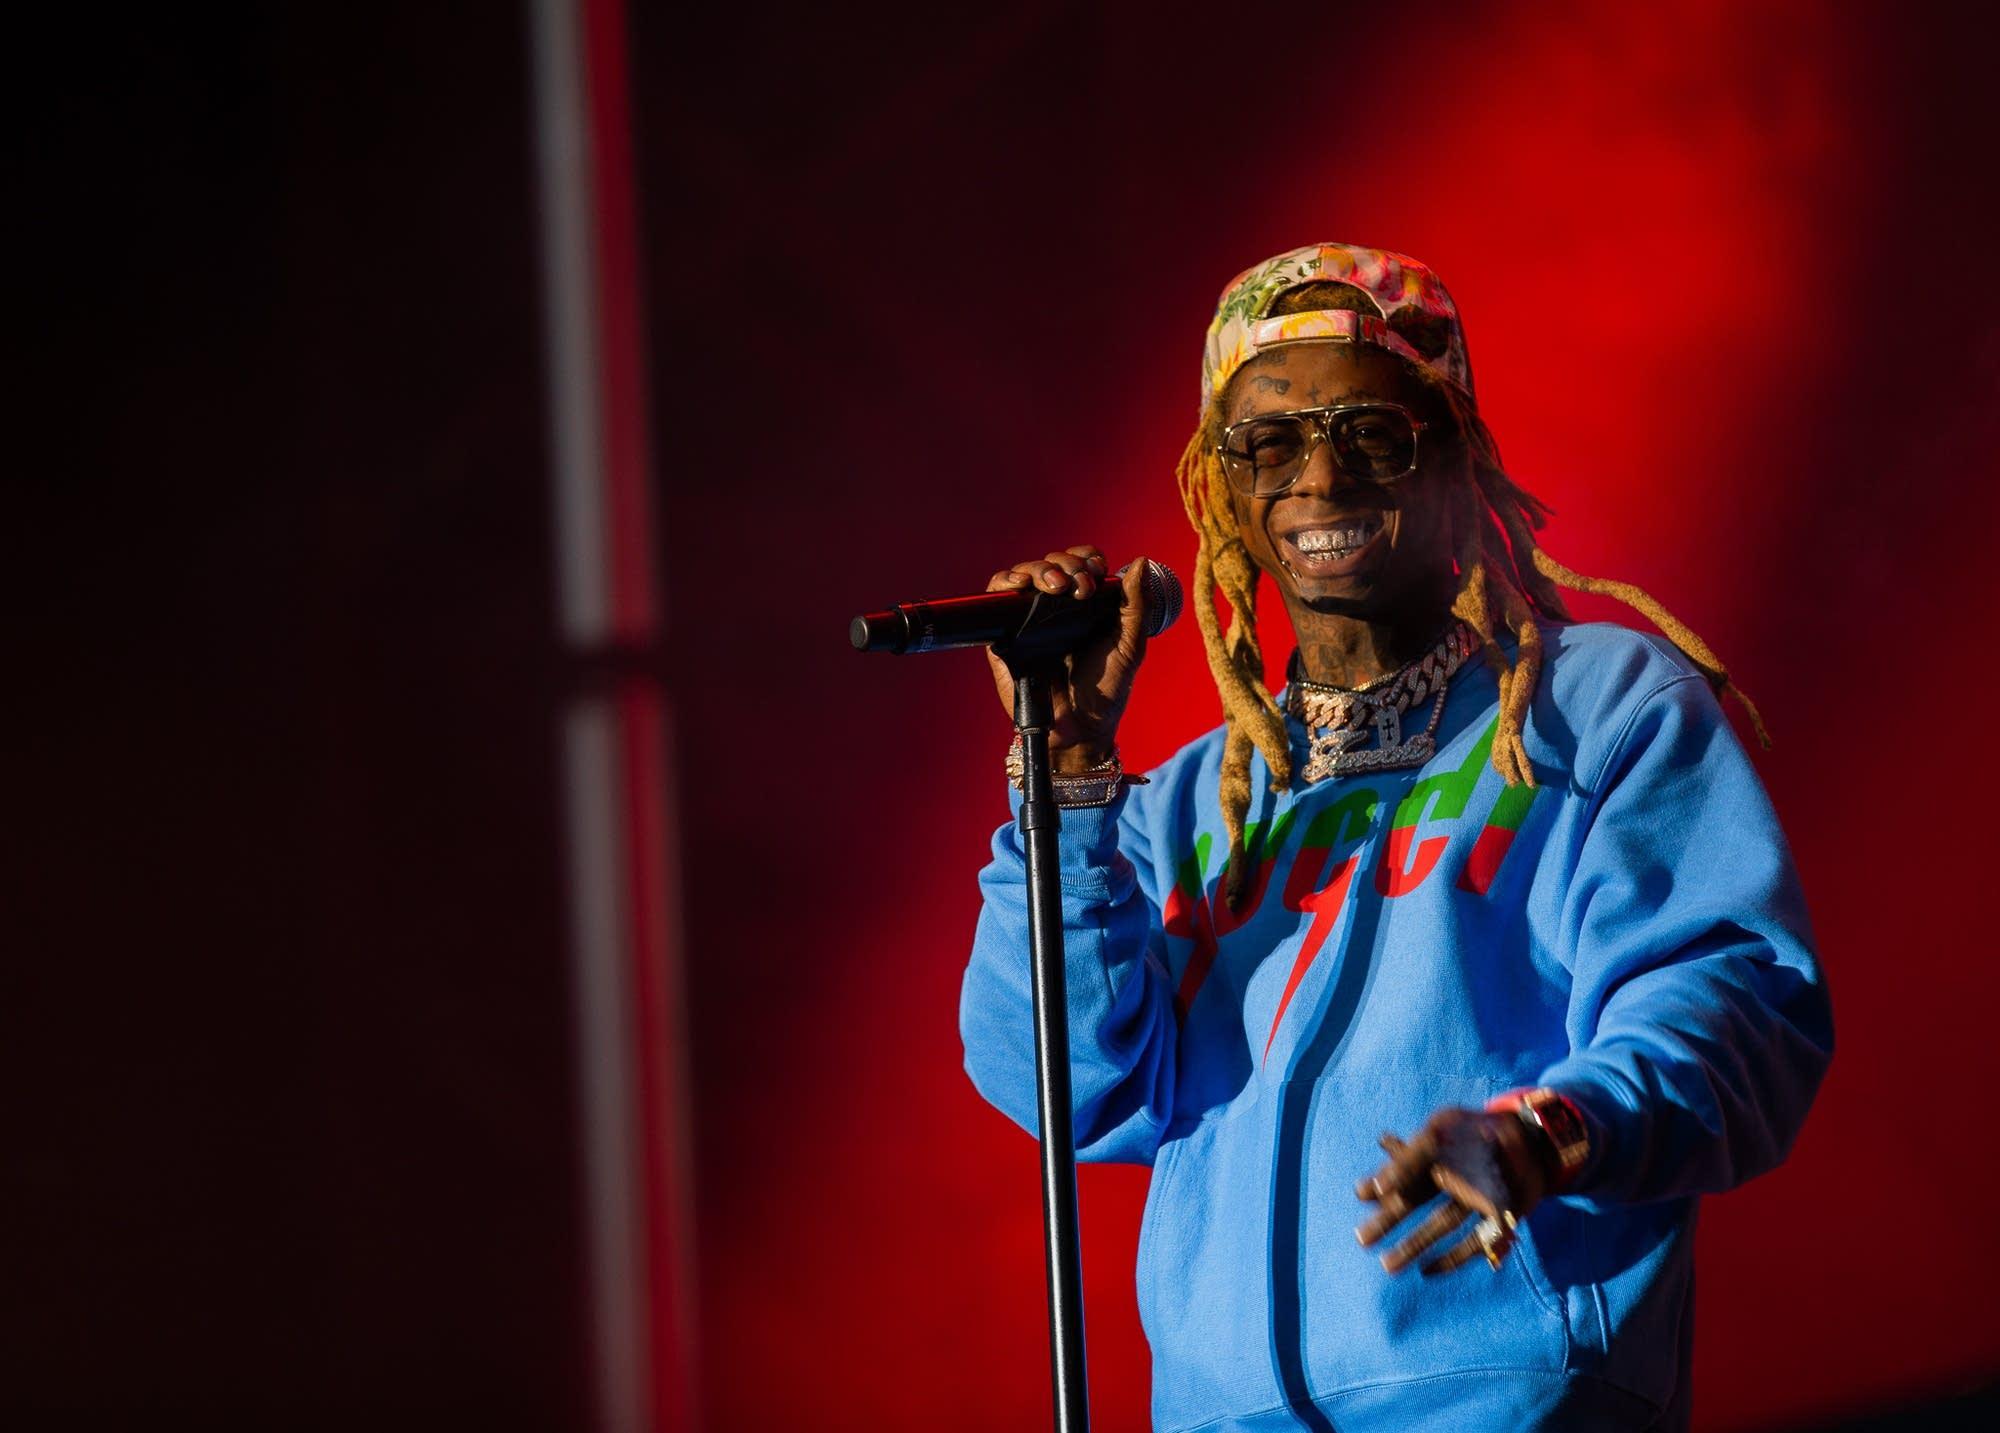 Photography: :Lil Wayne